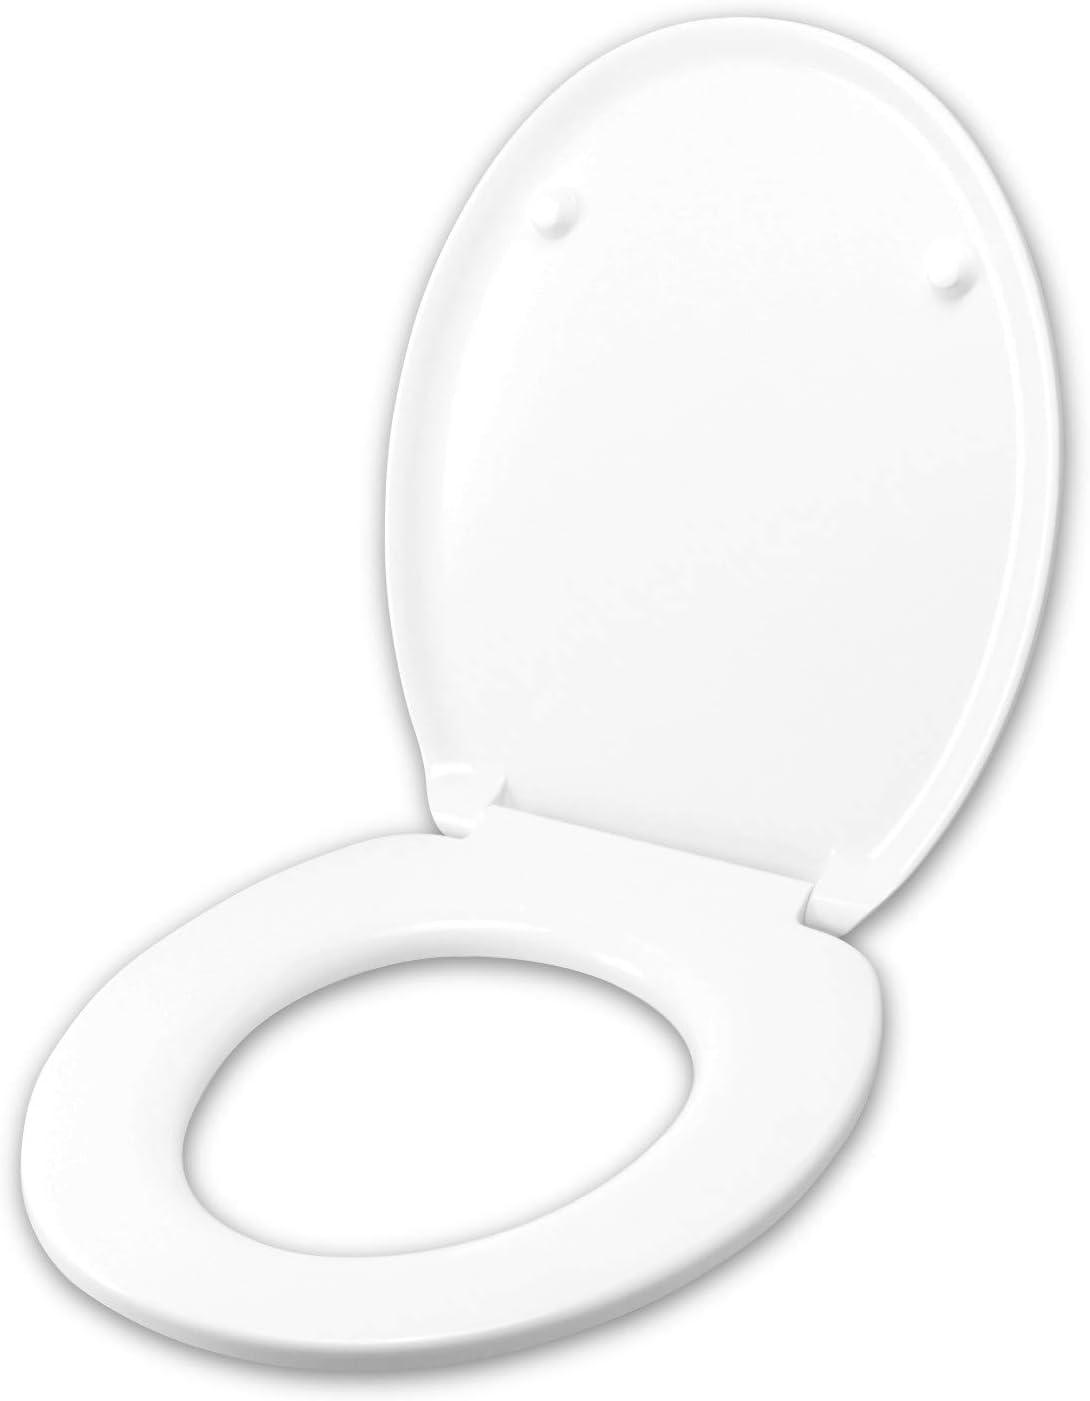 Tapa de inodoro para SIMAS ALFA TERMOINDURENTE BLANCO Bisagra Inox normal o ralentizada Soft Close